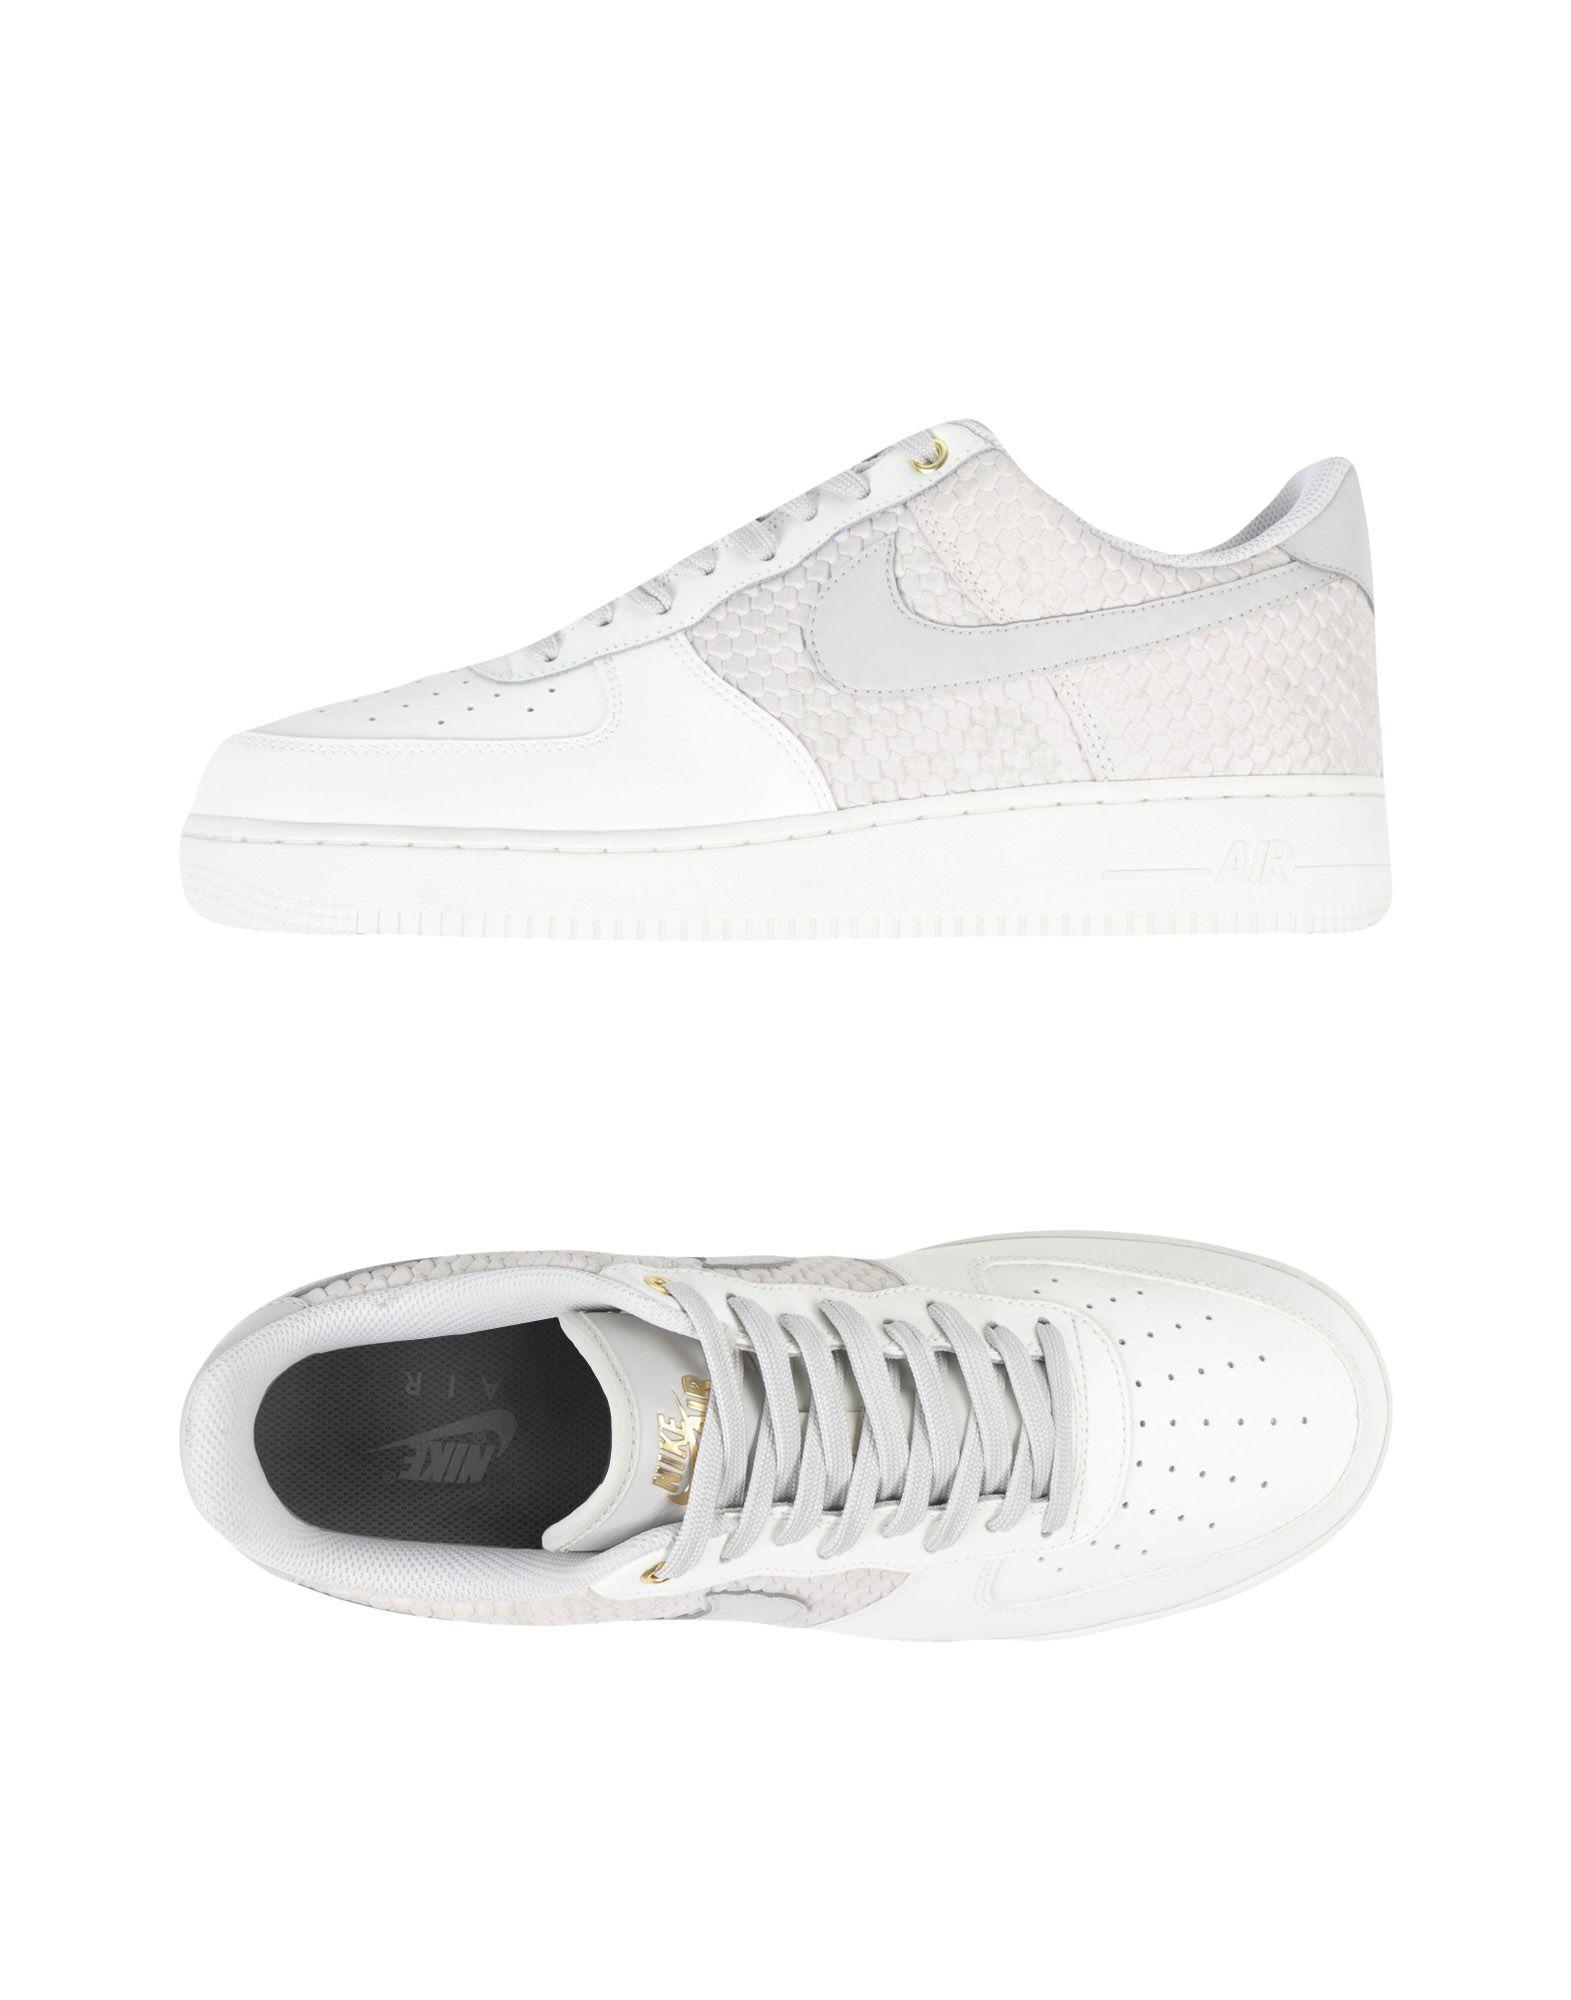 Sneakers Nike Air Force 1 '07 Lv8 - Uomo - 11347142WE